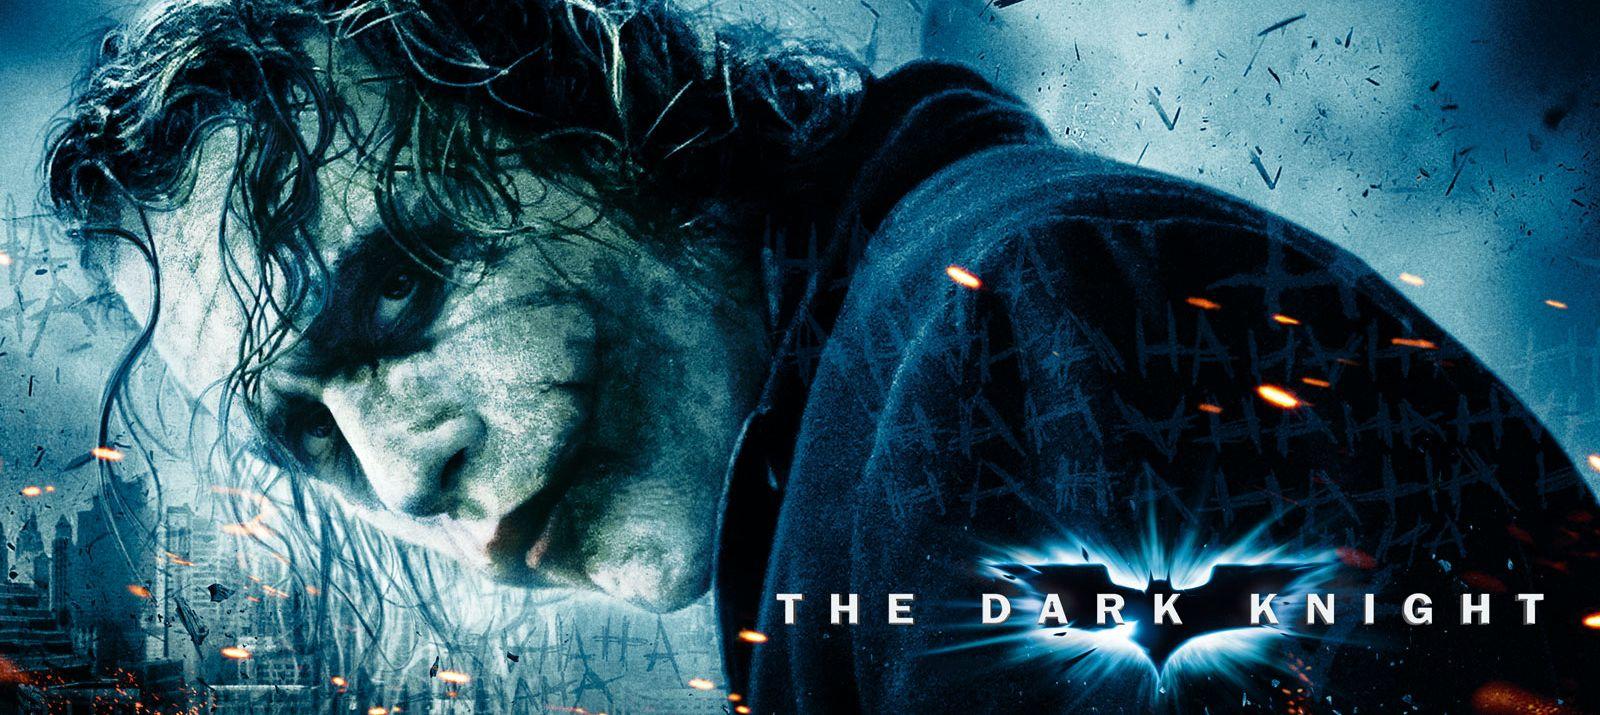 Dark Knight Falls Wallpaper Self Interest And Sacrifice In The Dark Knight C Orthodoxy